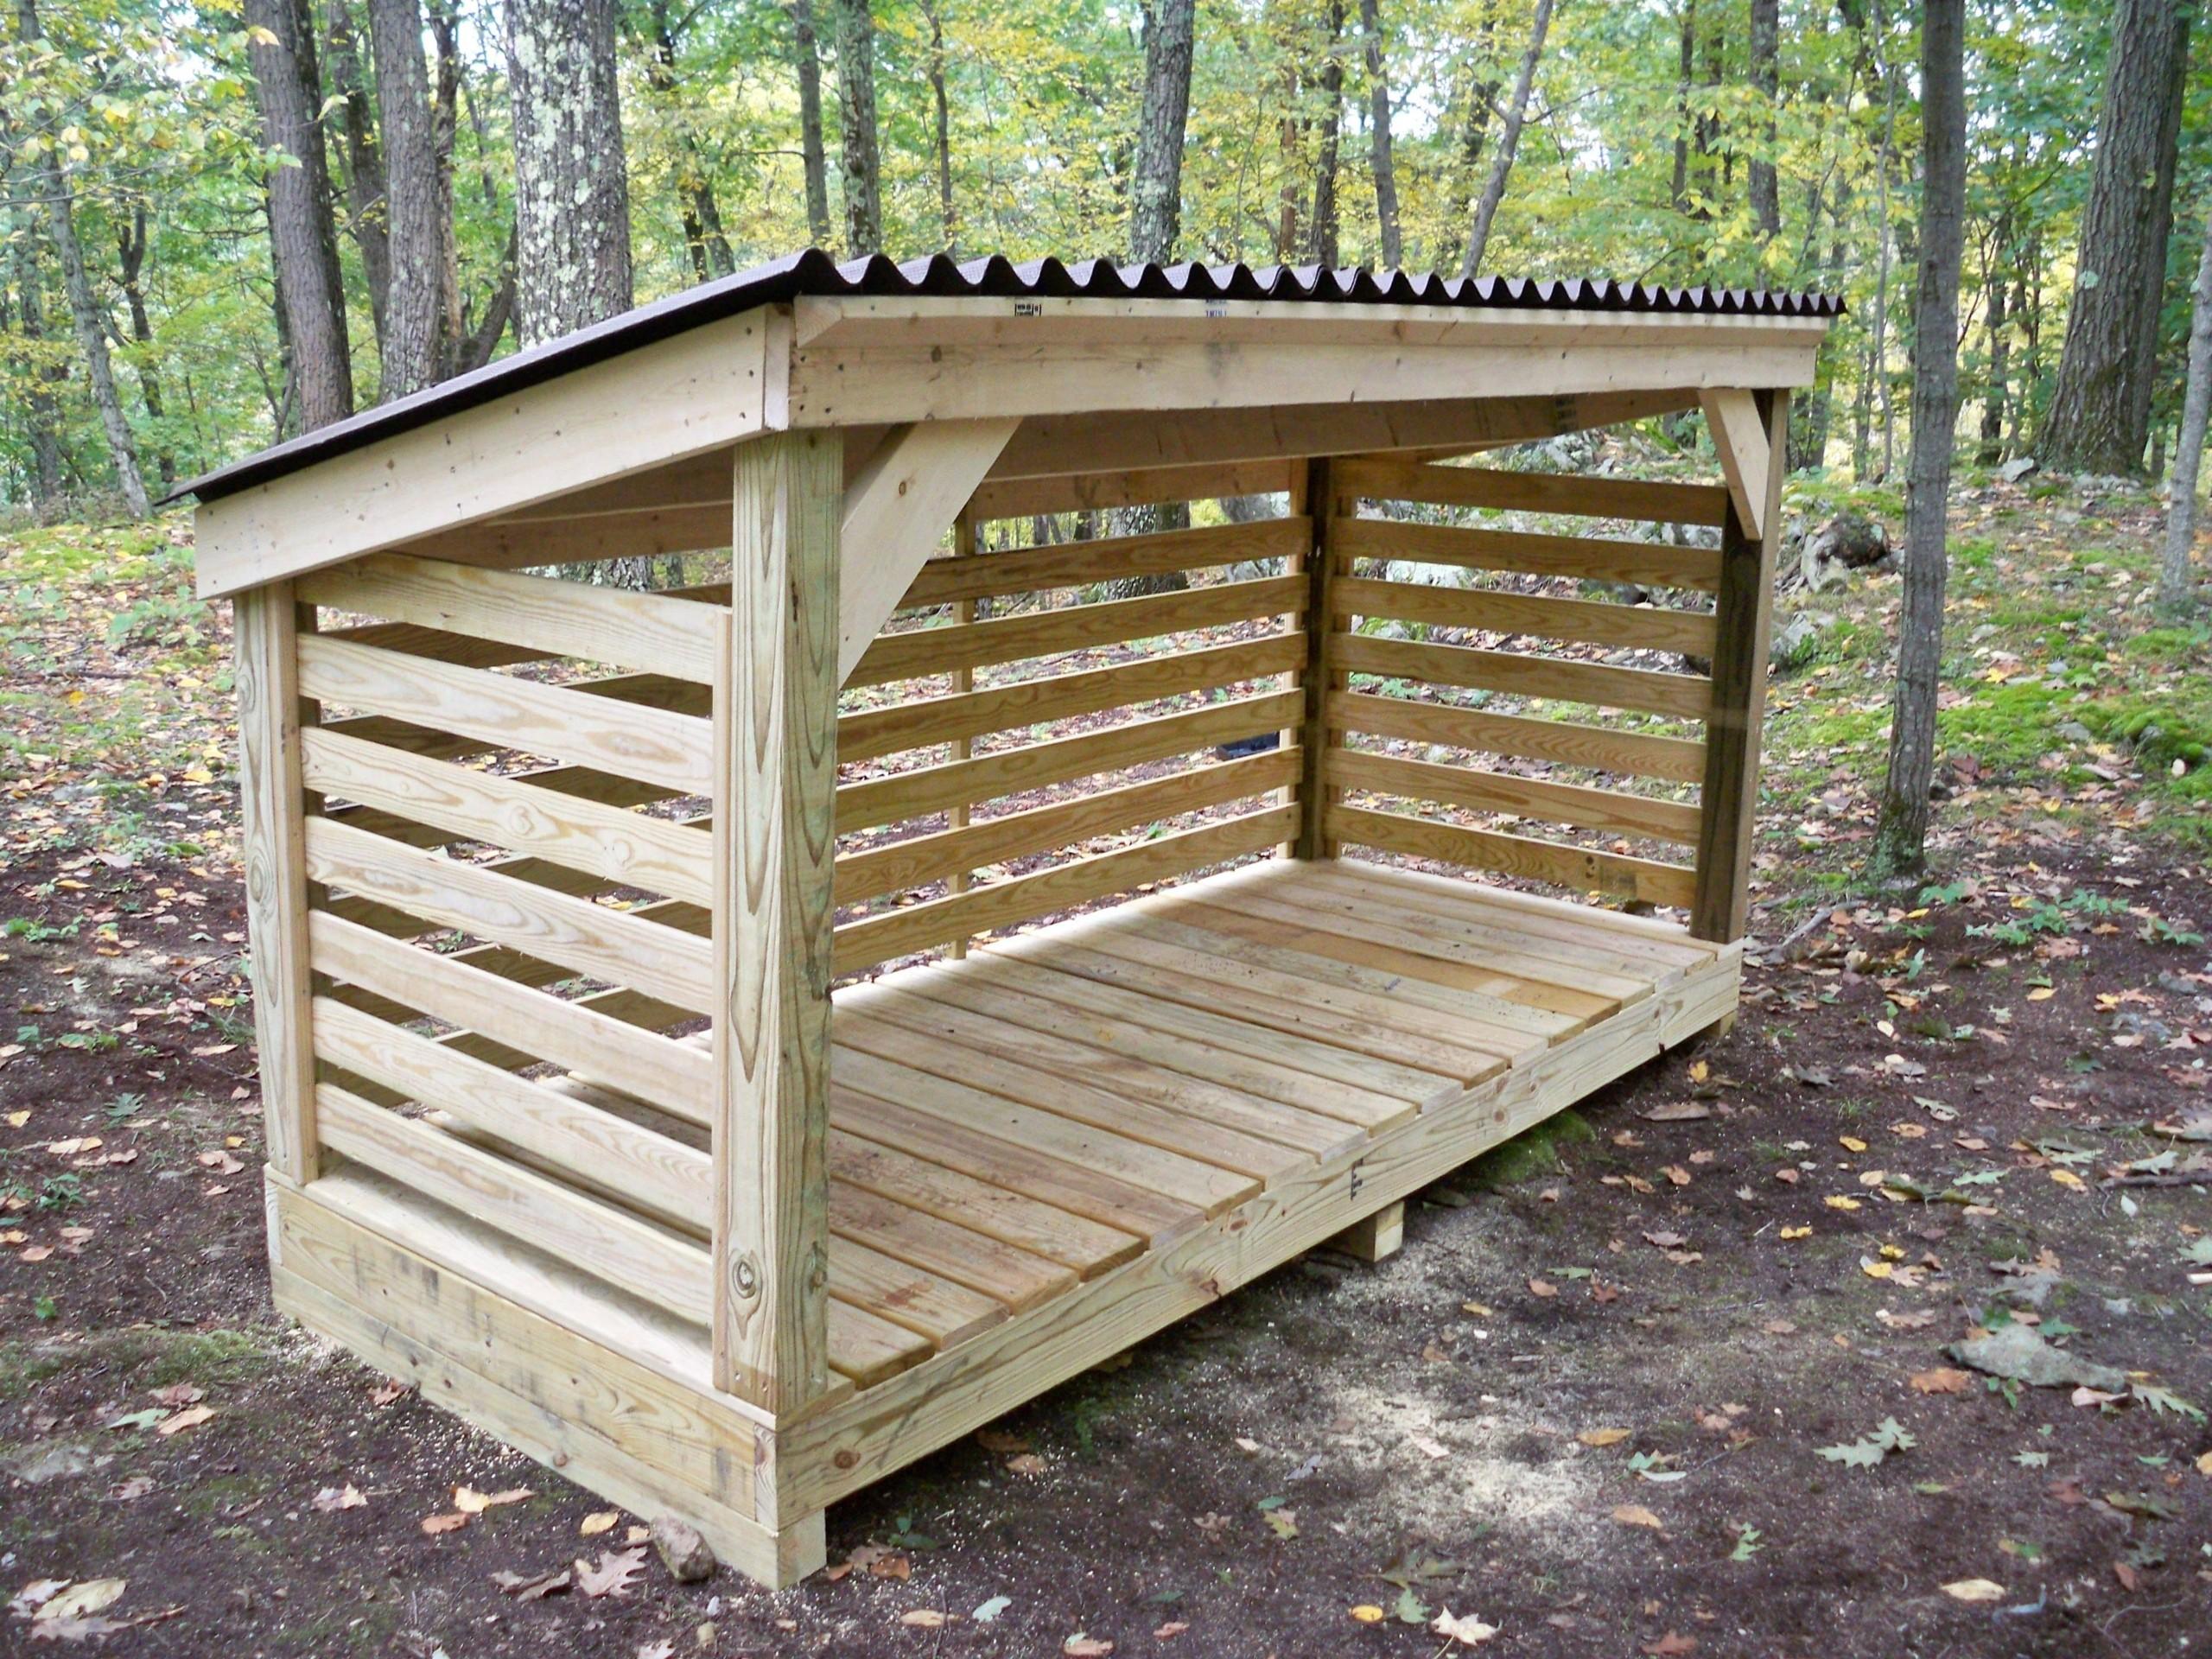 Outdoor Storage Box Wood Foter & Outdoor Storage Box Wood - Listitdallas